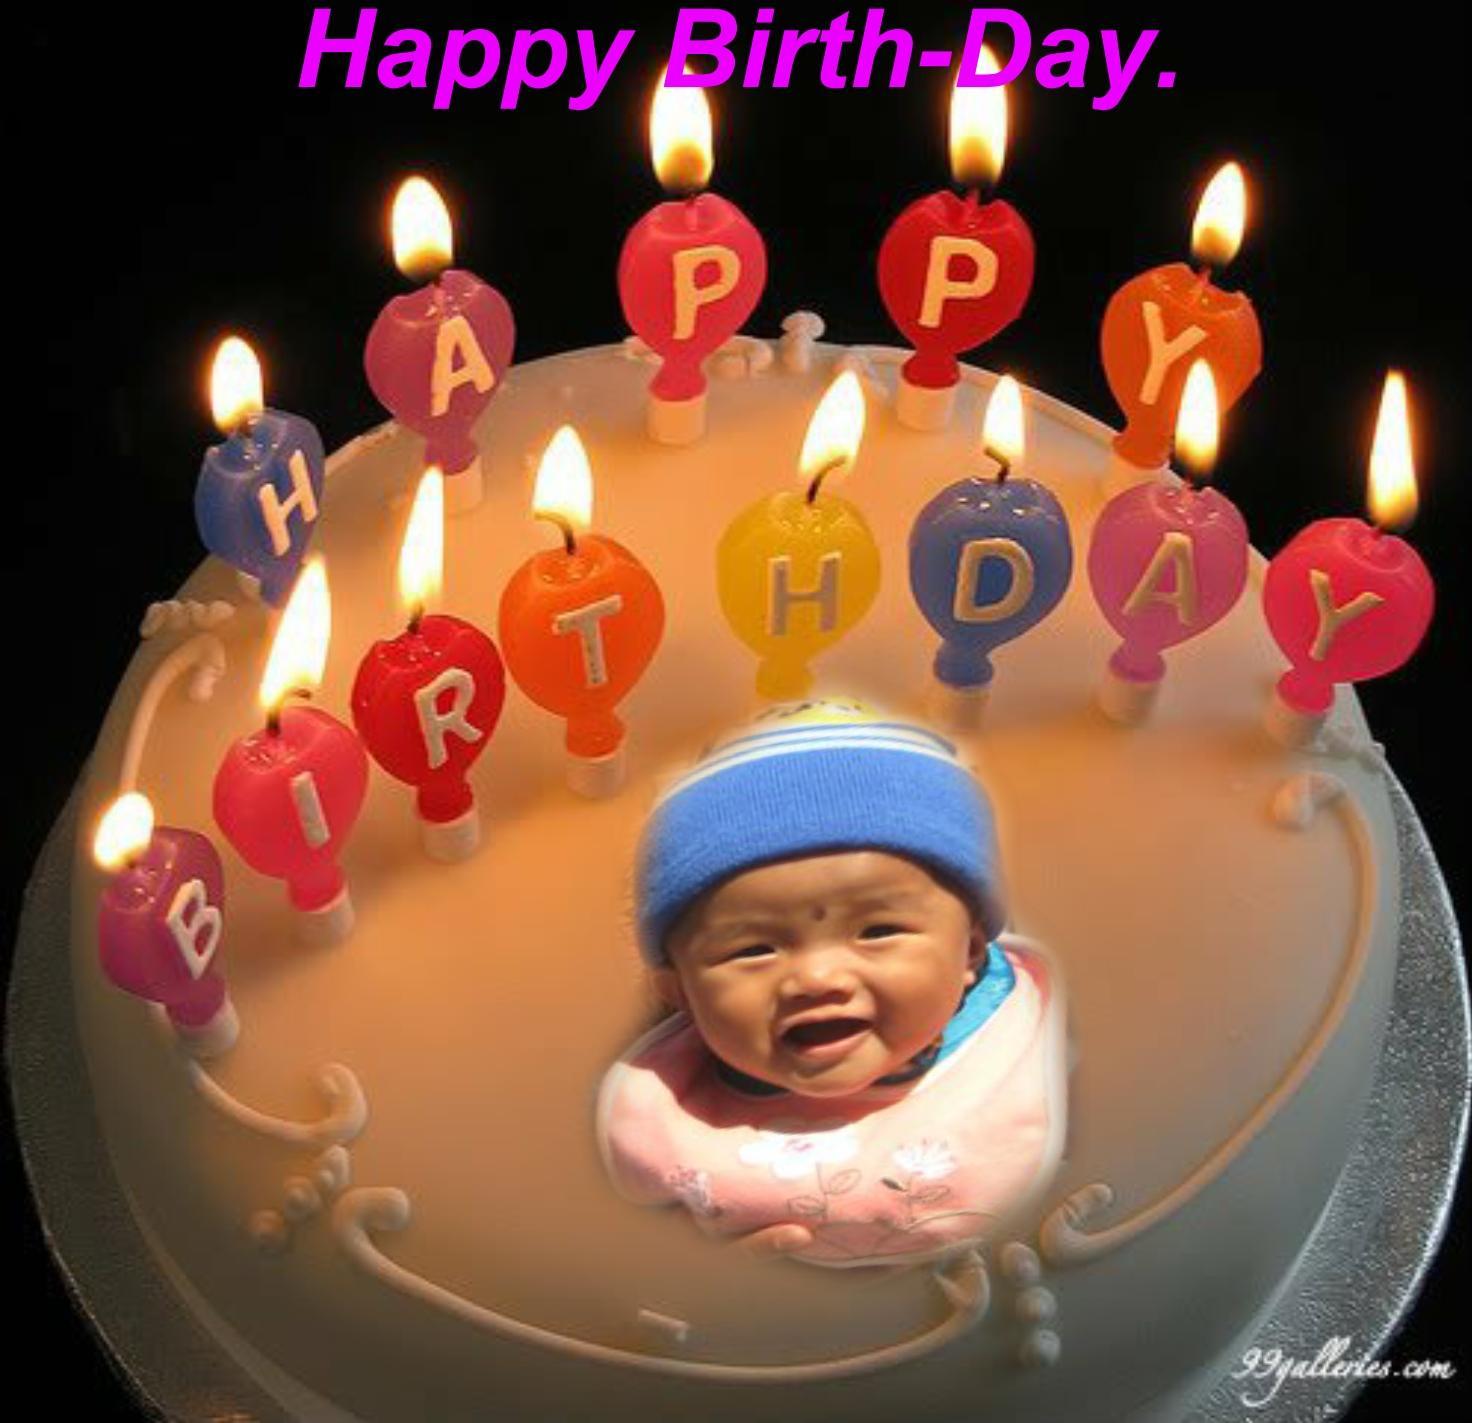 Imikimi Zo - Picture Frames - Happy Birth-Day Nepali frame - ngima108